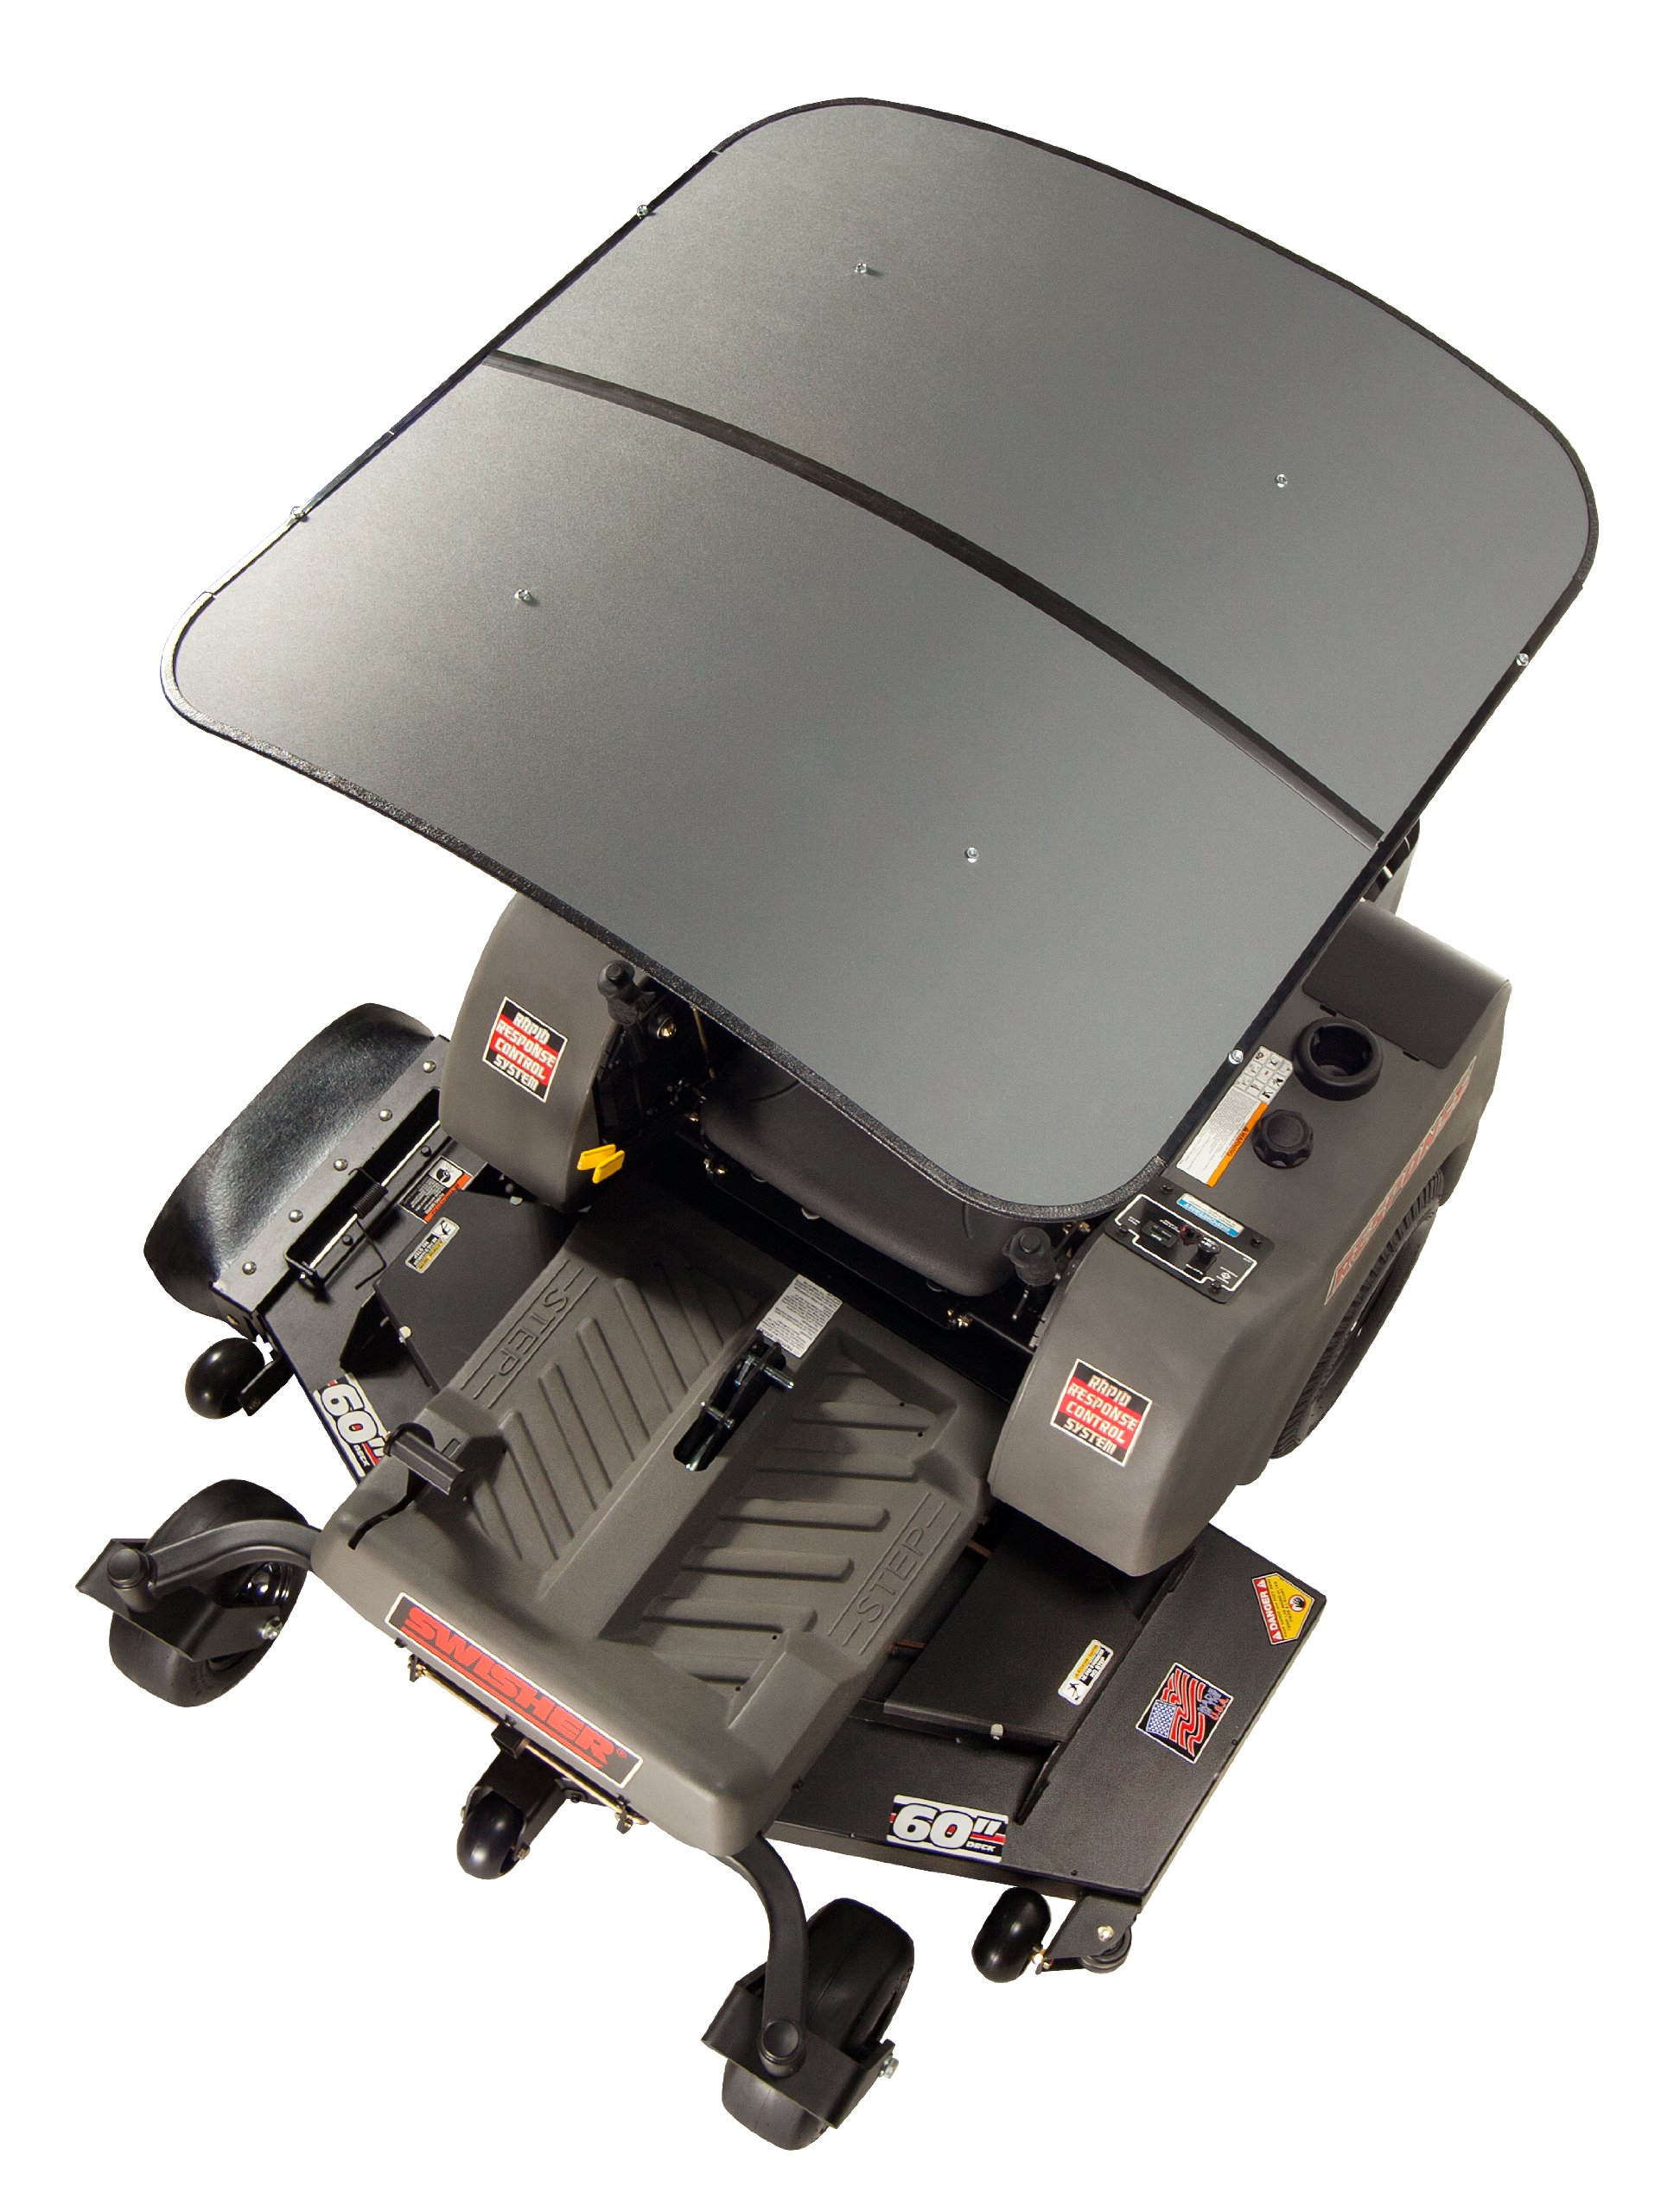 Femco SS4444G Tuff Top ZTR Sunshade for Lawn Mower by Femco (Image #1)